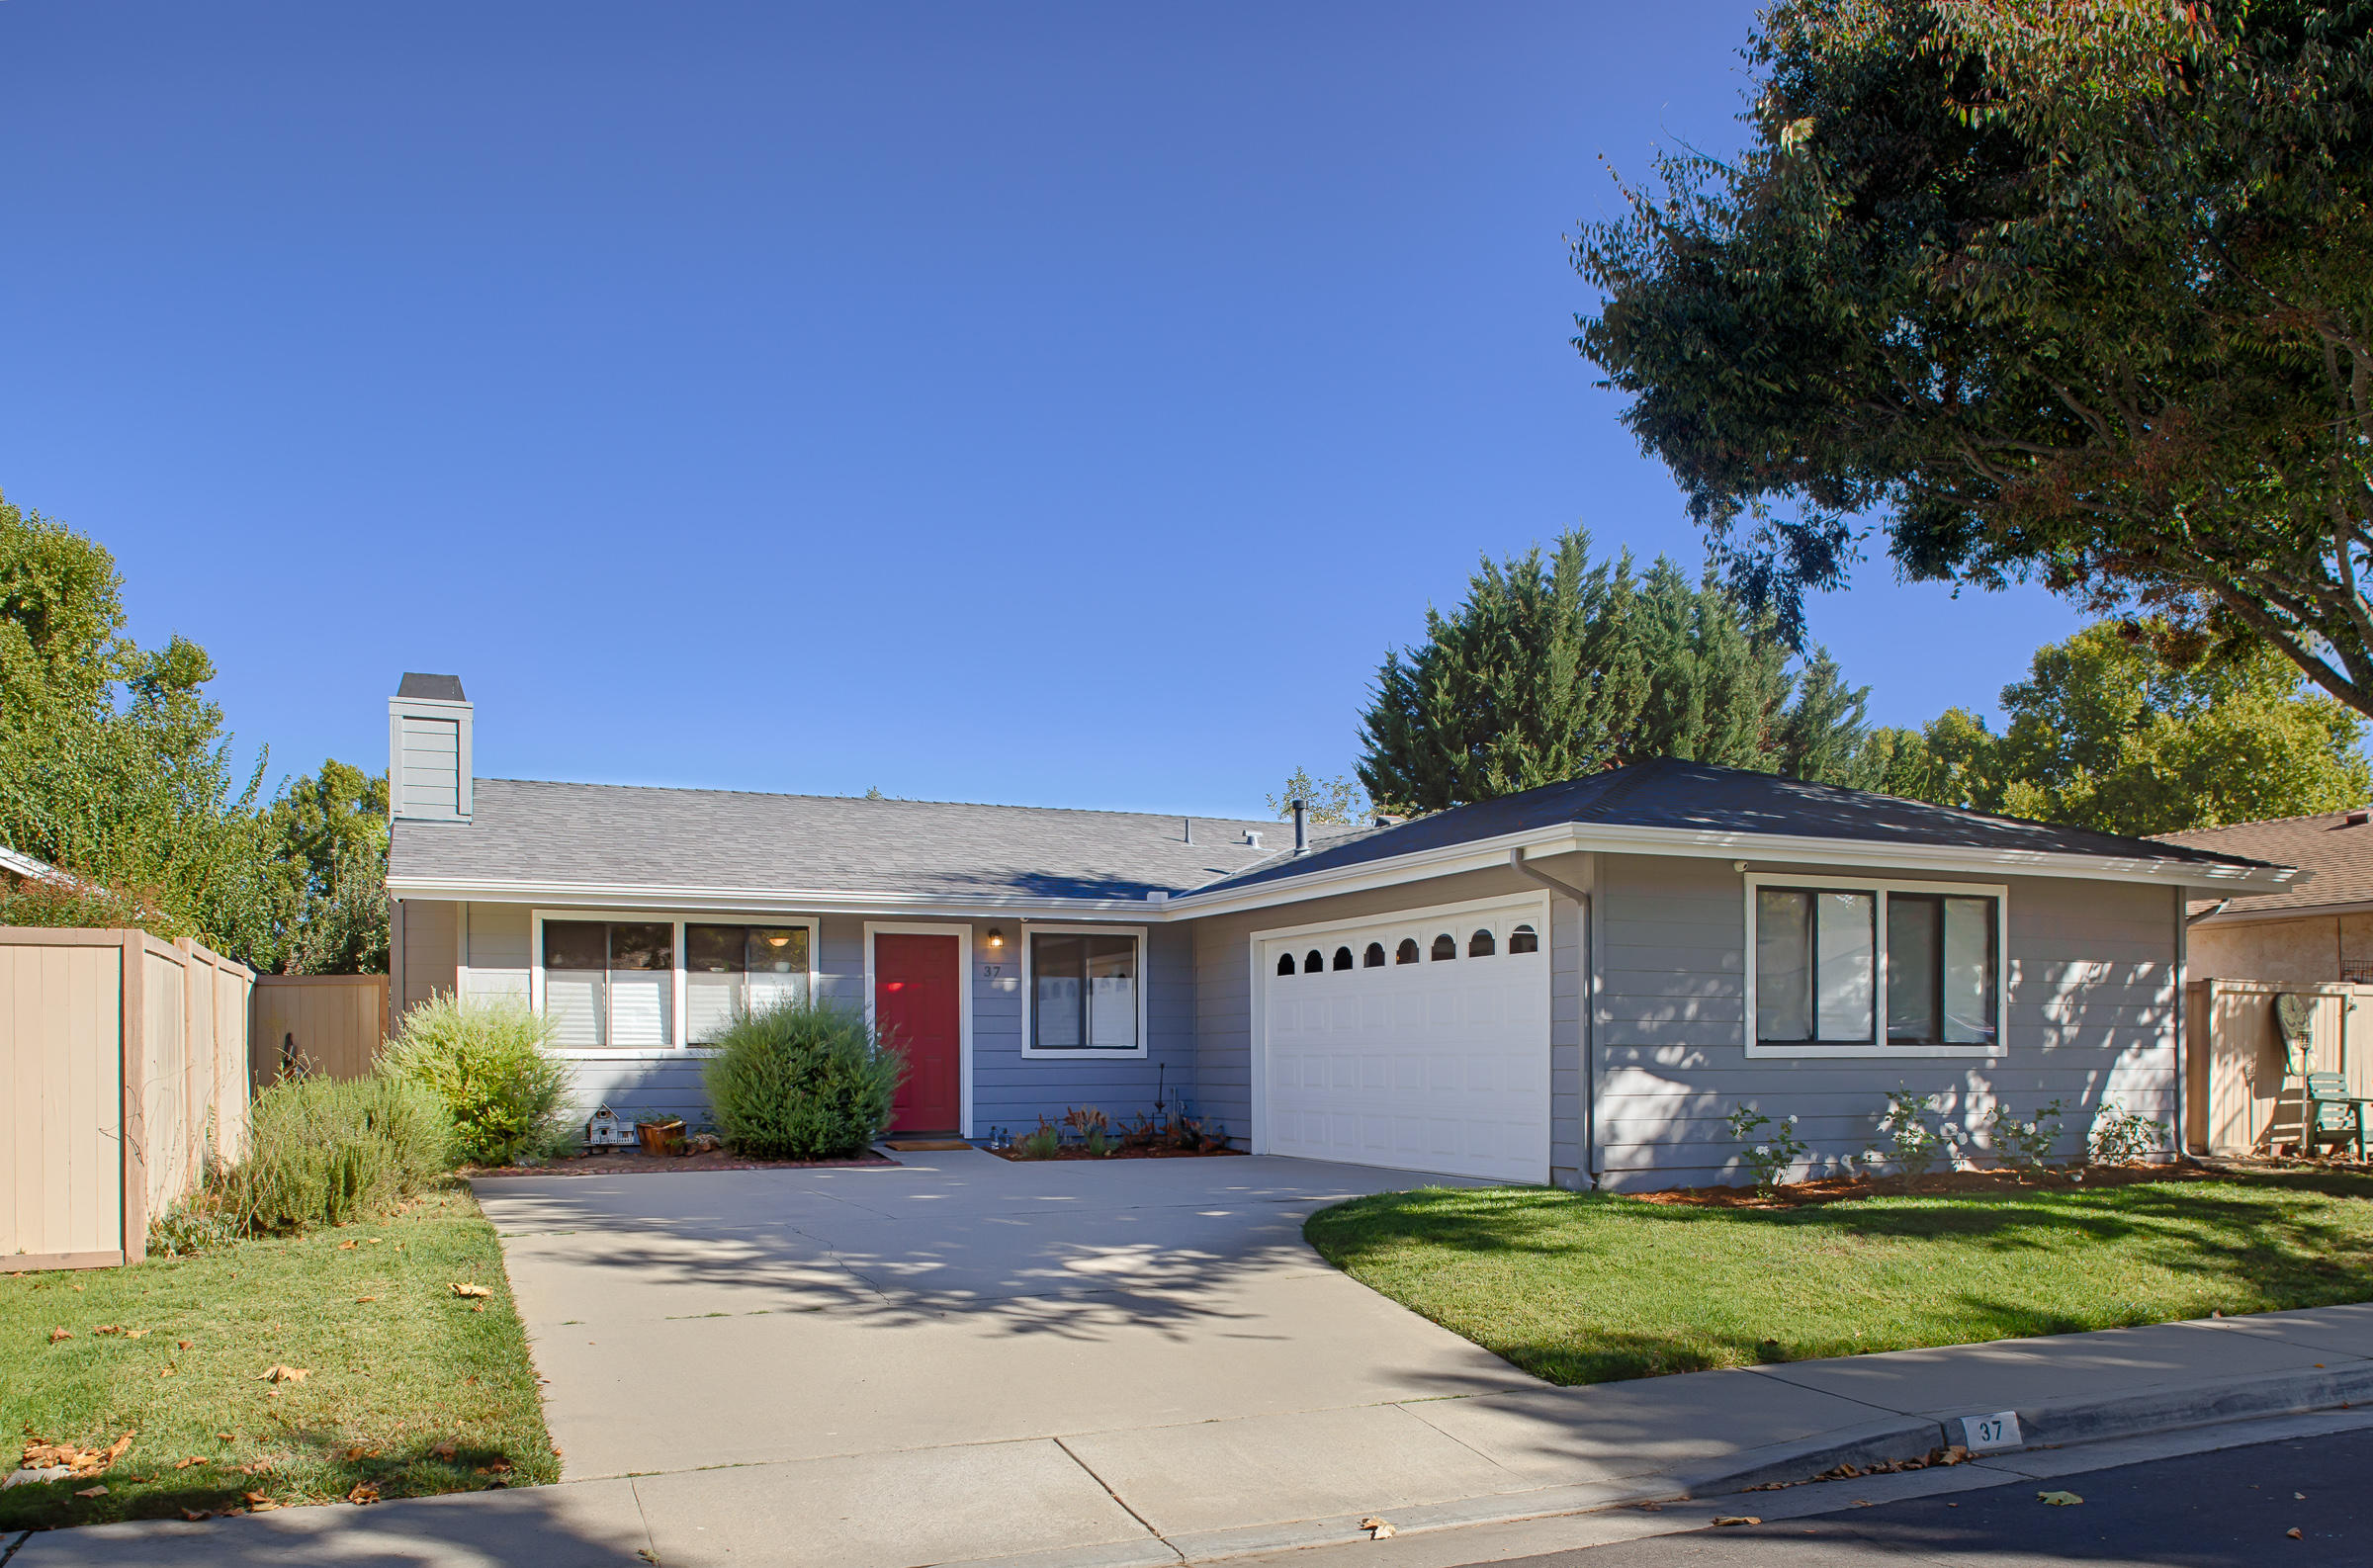 Property photo for 37 Bundy Cir Buellton, California 93427 - 18-3694